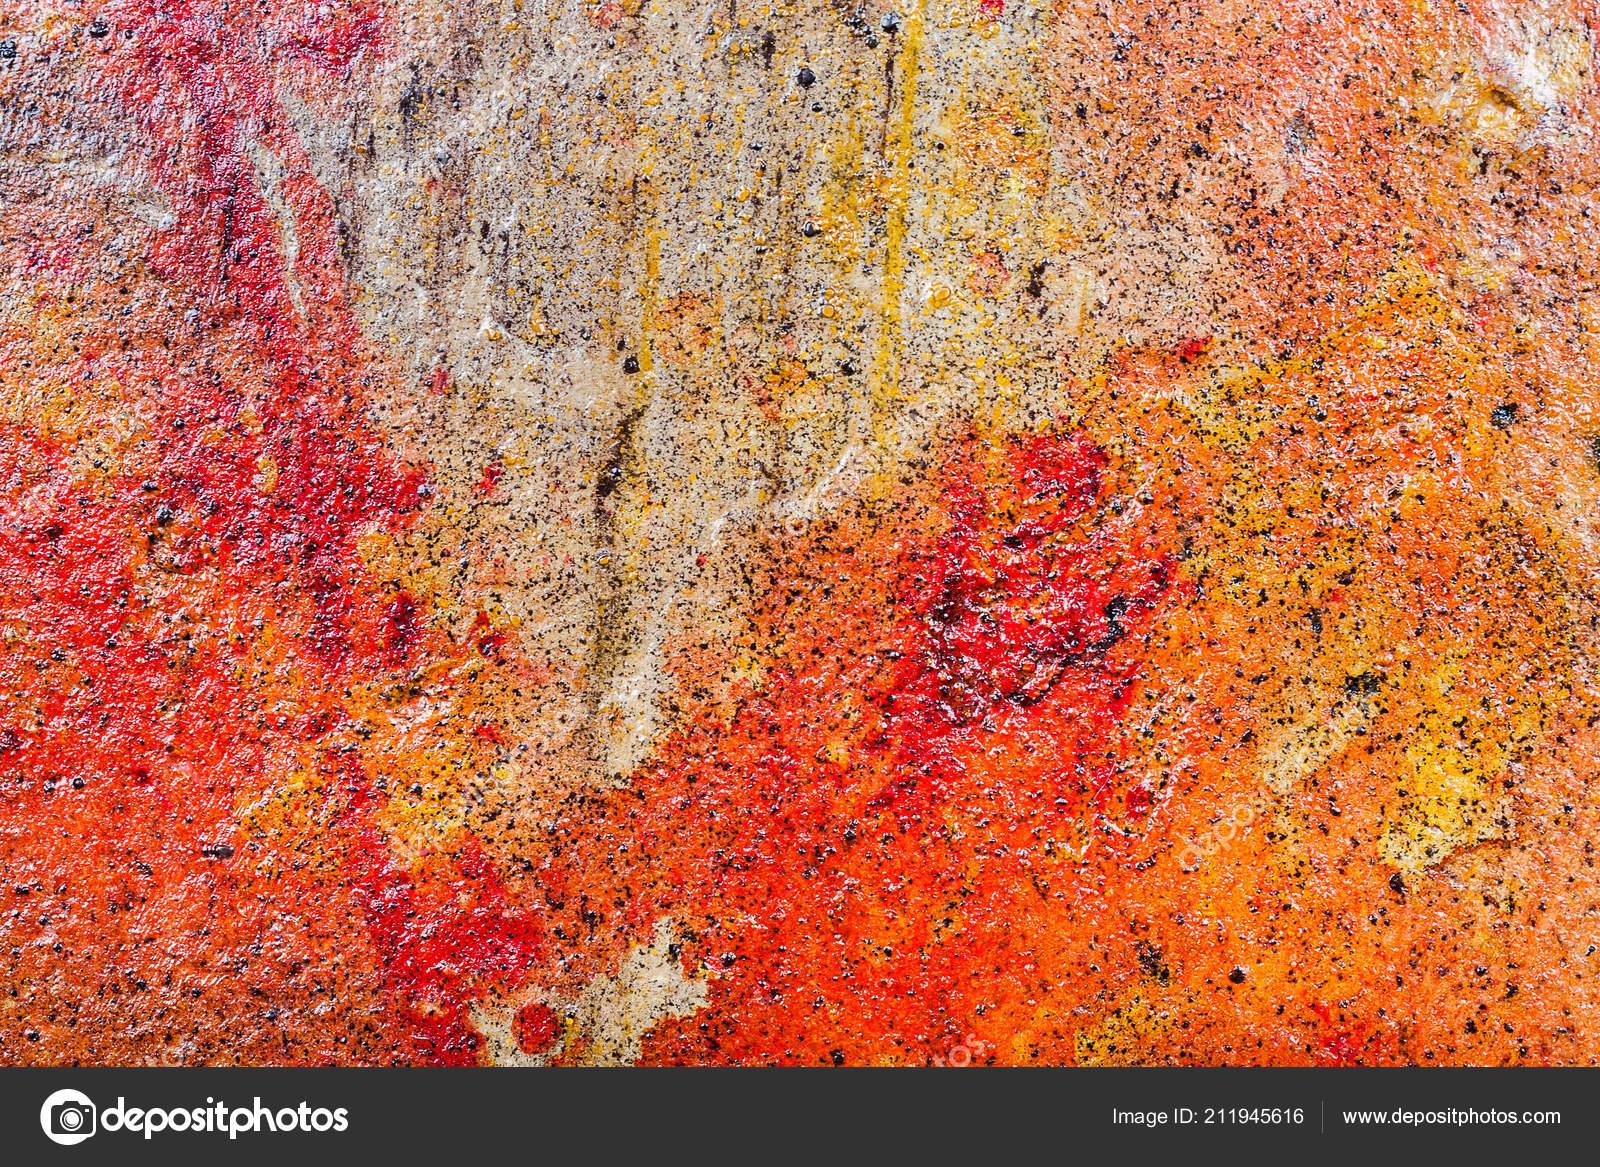 Fond Texture Mur Jaune Brun Rouge Malpropre Stuc Peinture